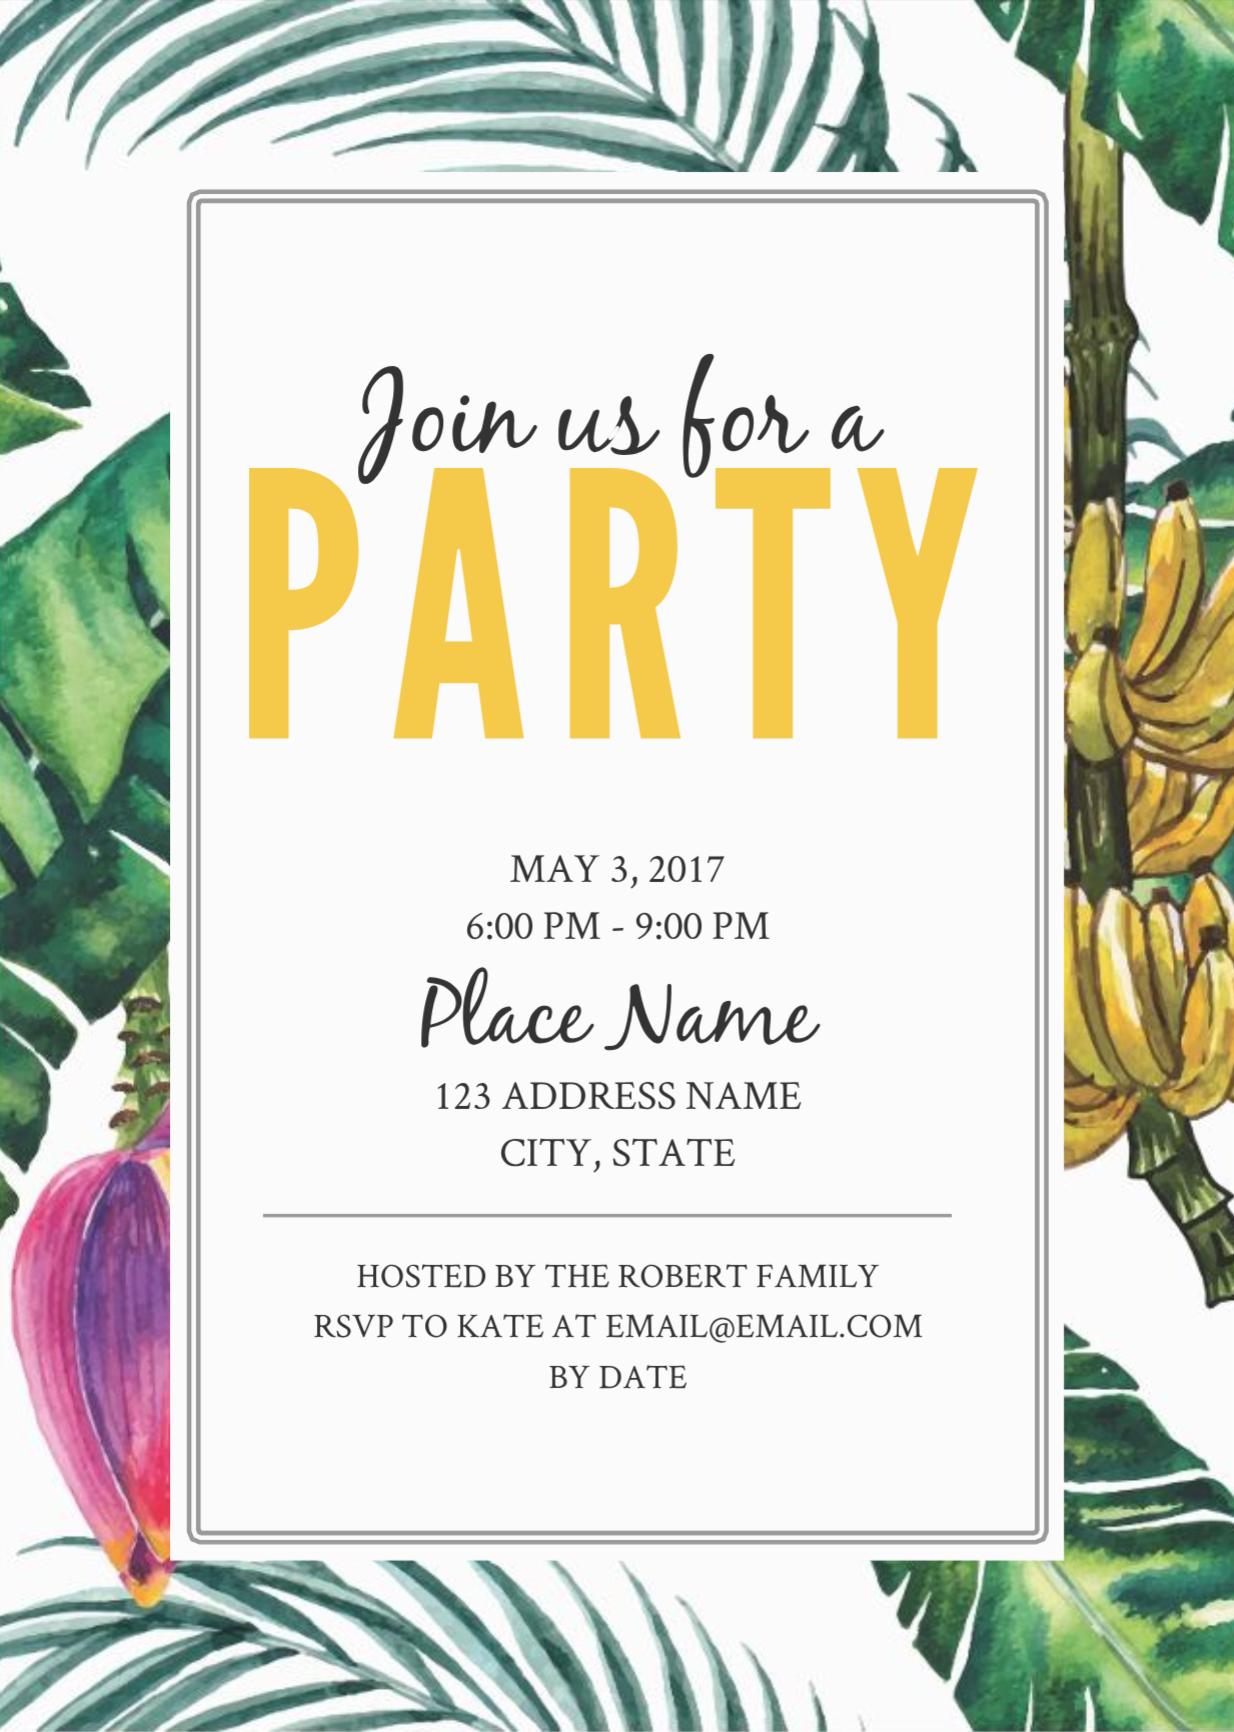 Jungle Party Invitation Template Customize This Invitation Template Online With Free Party Invitation Templates Free Party Invitations Free Invitation Cards